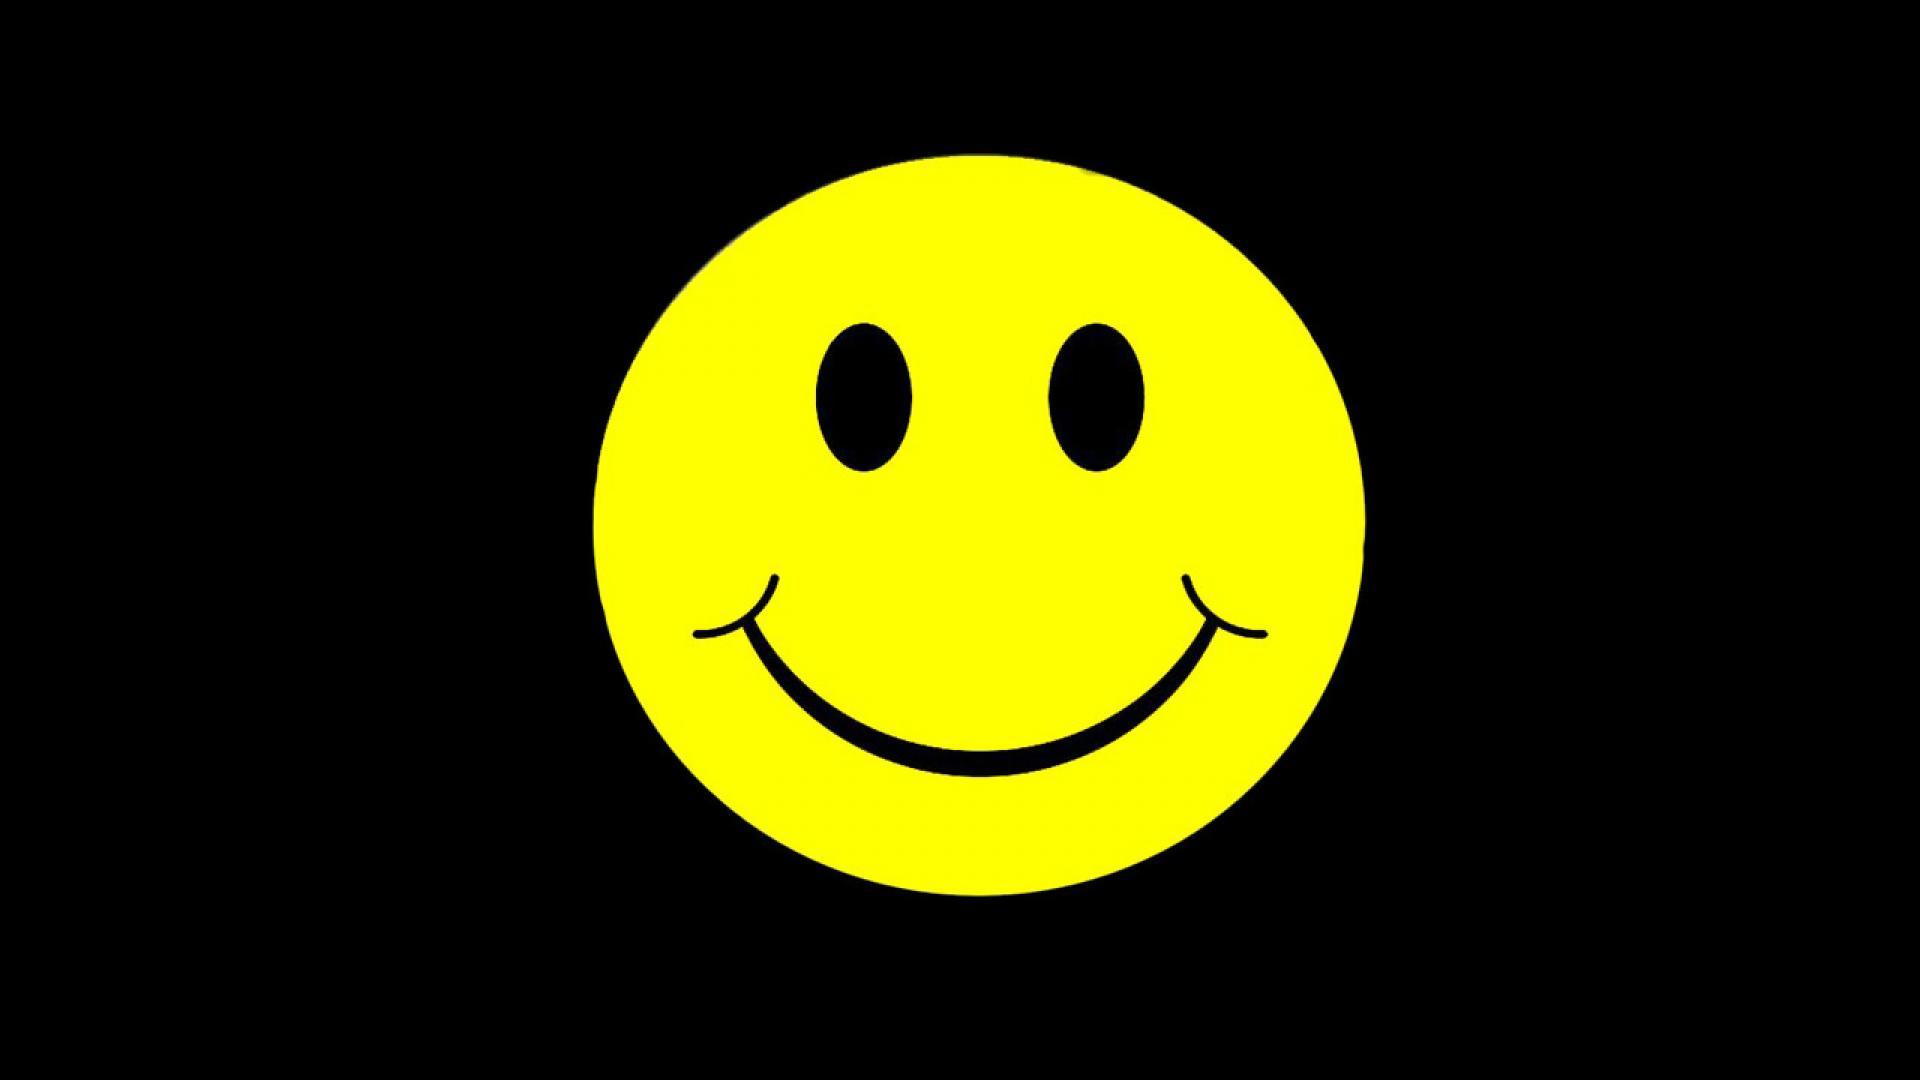 [75+] Smiley Face Black Background on WallpaperSafari